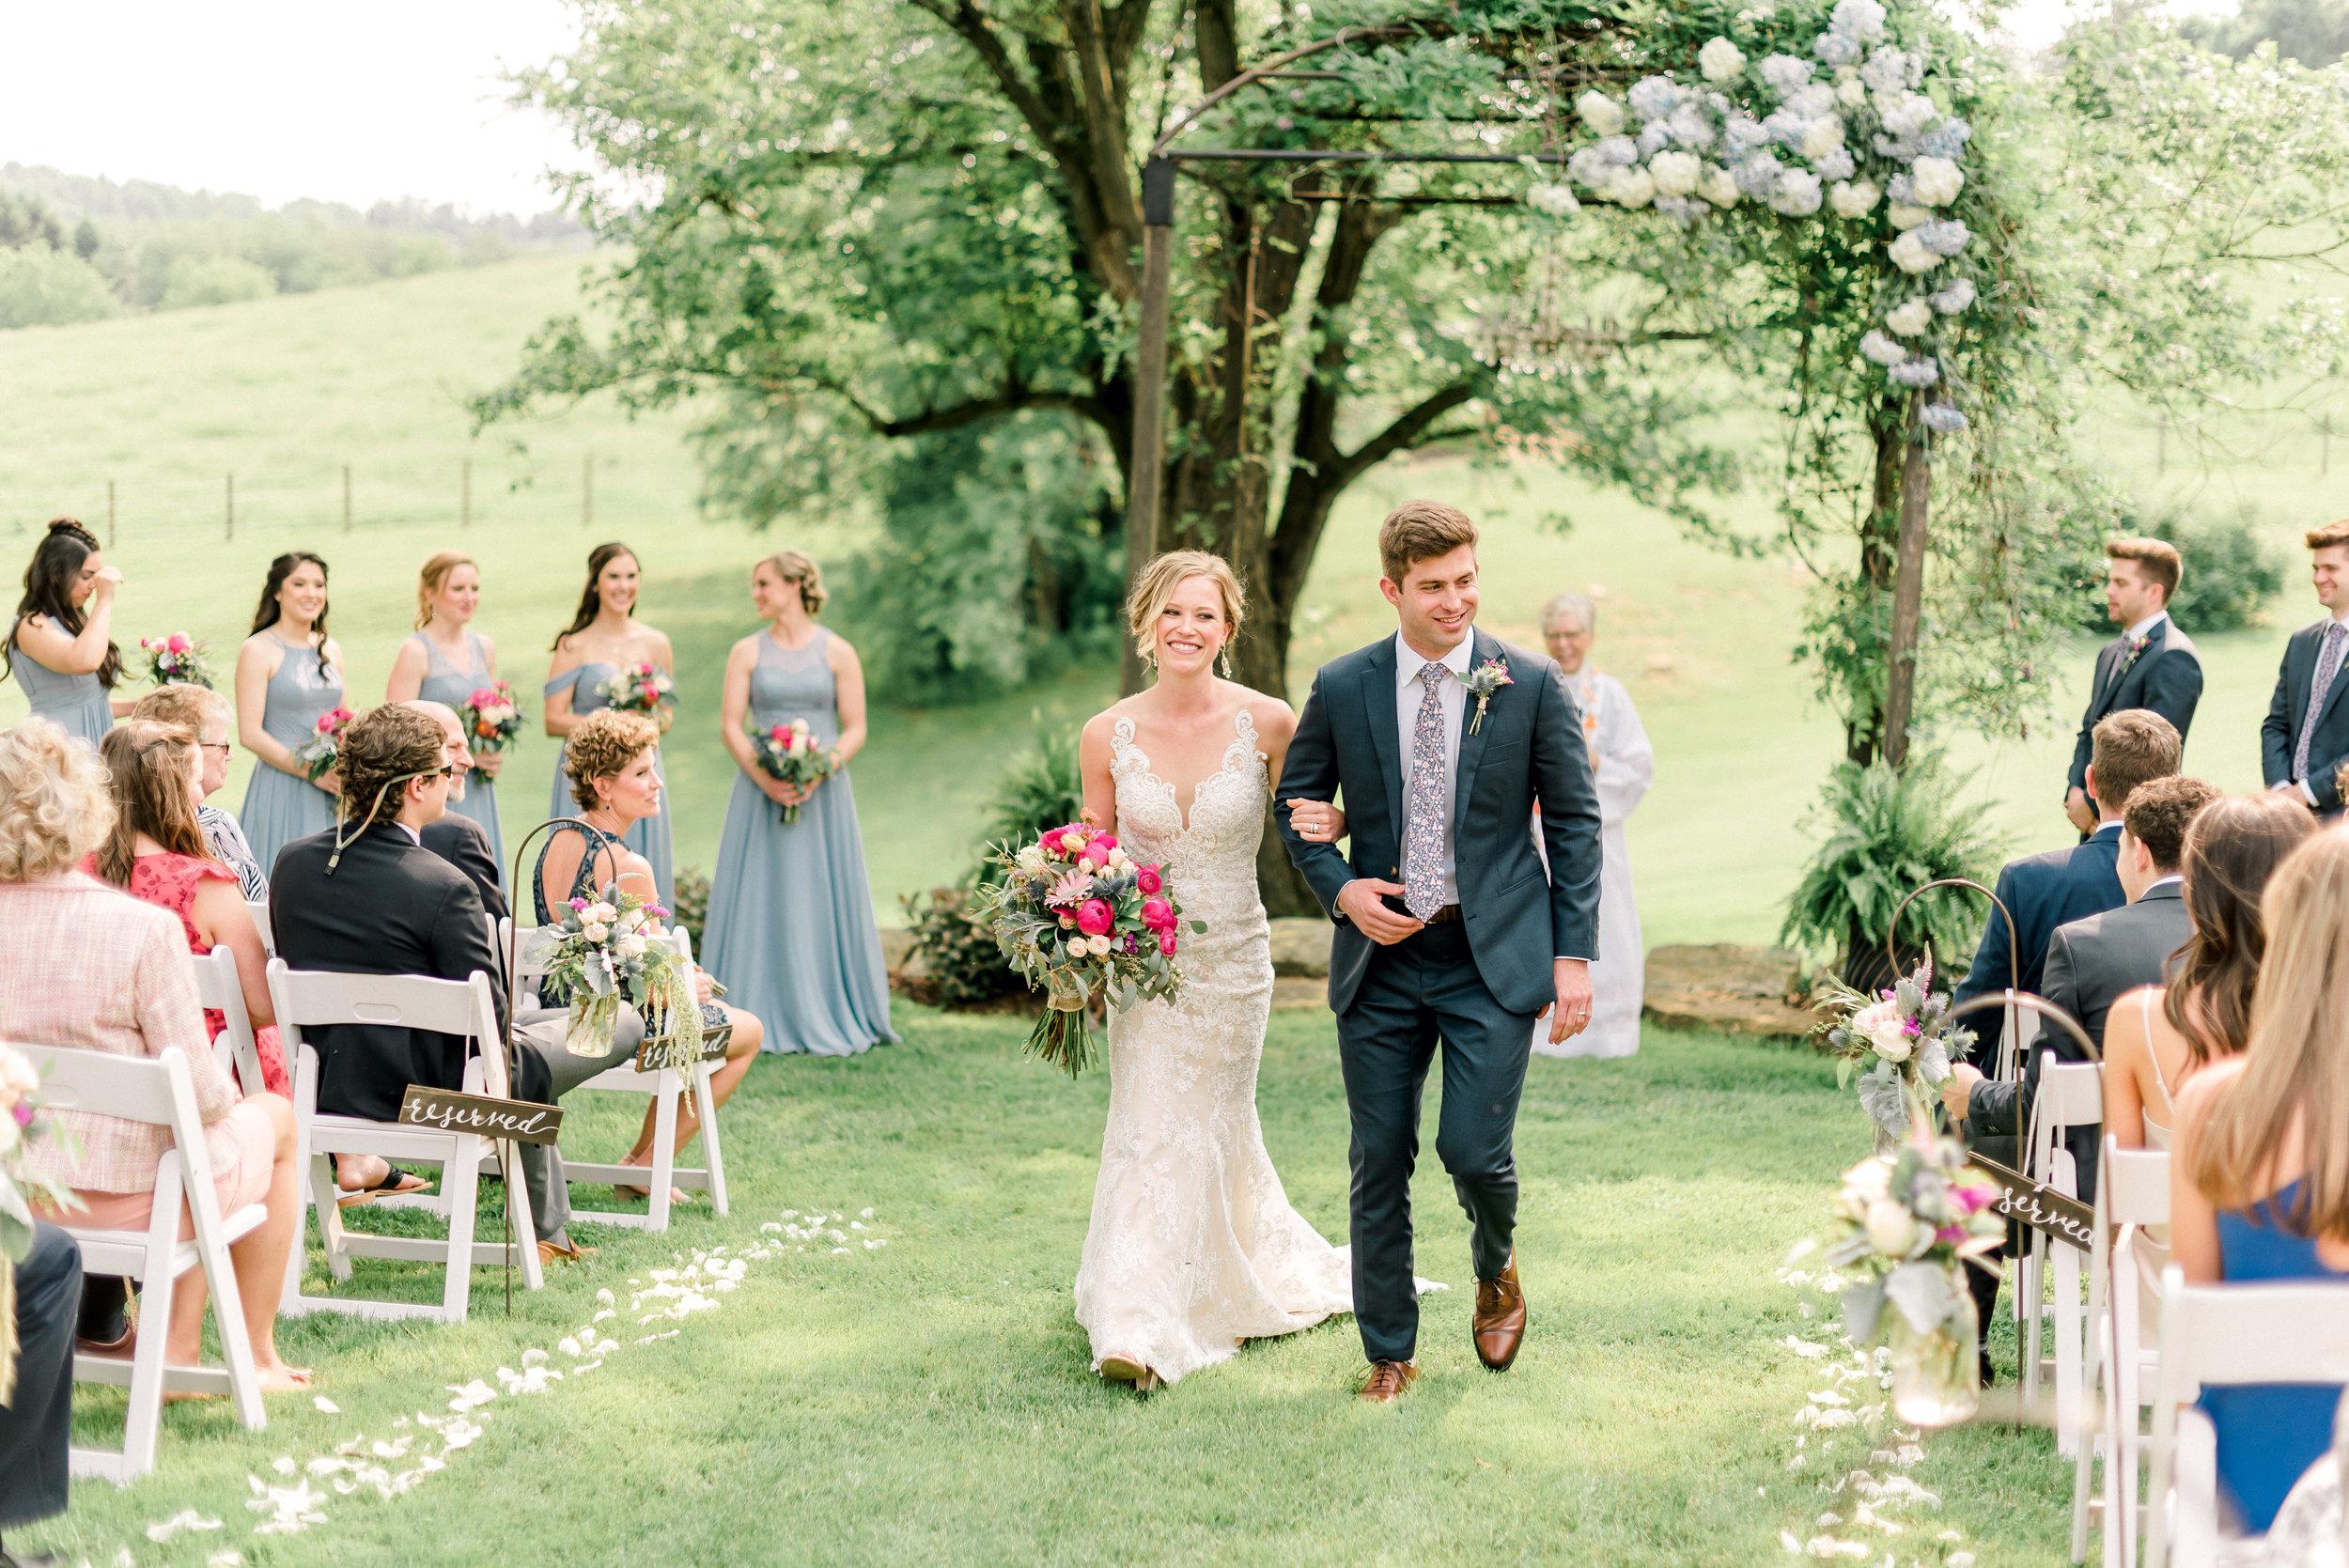 pittsburgh-wedding-photographer-shady-elms-farm-0044.jpg